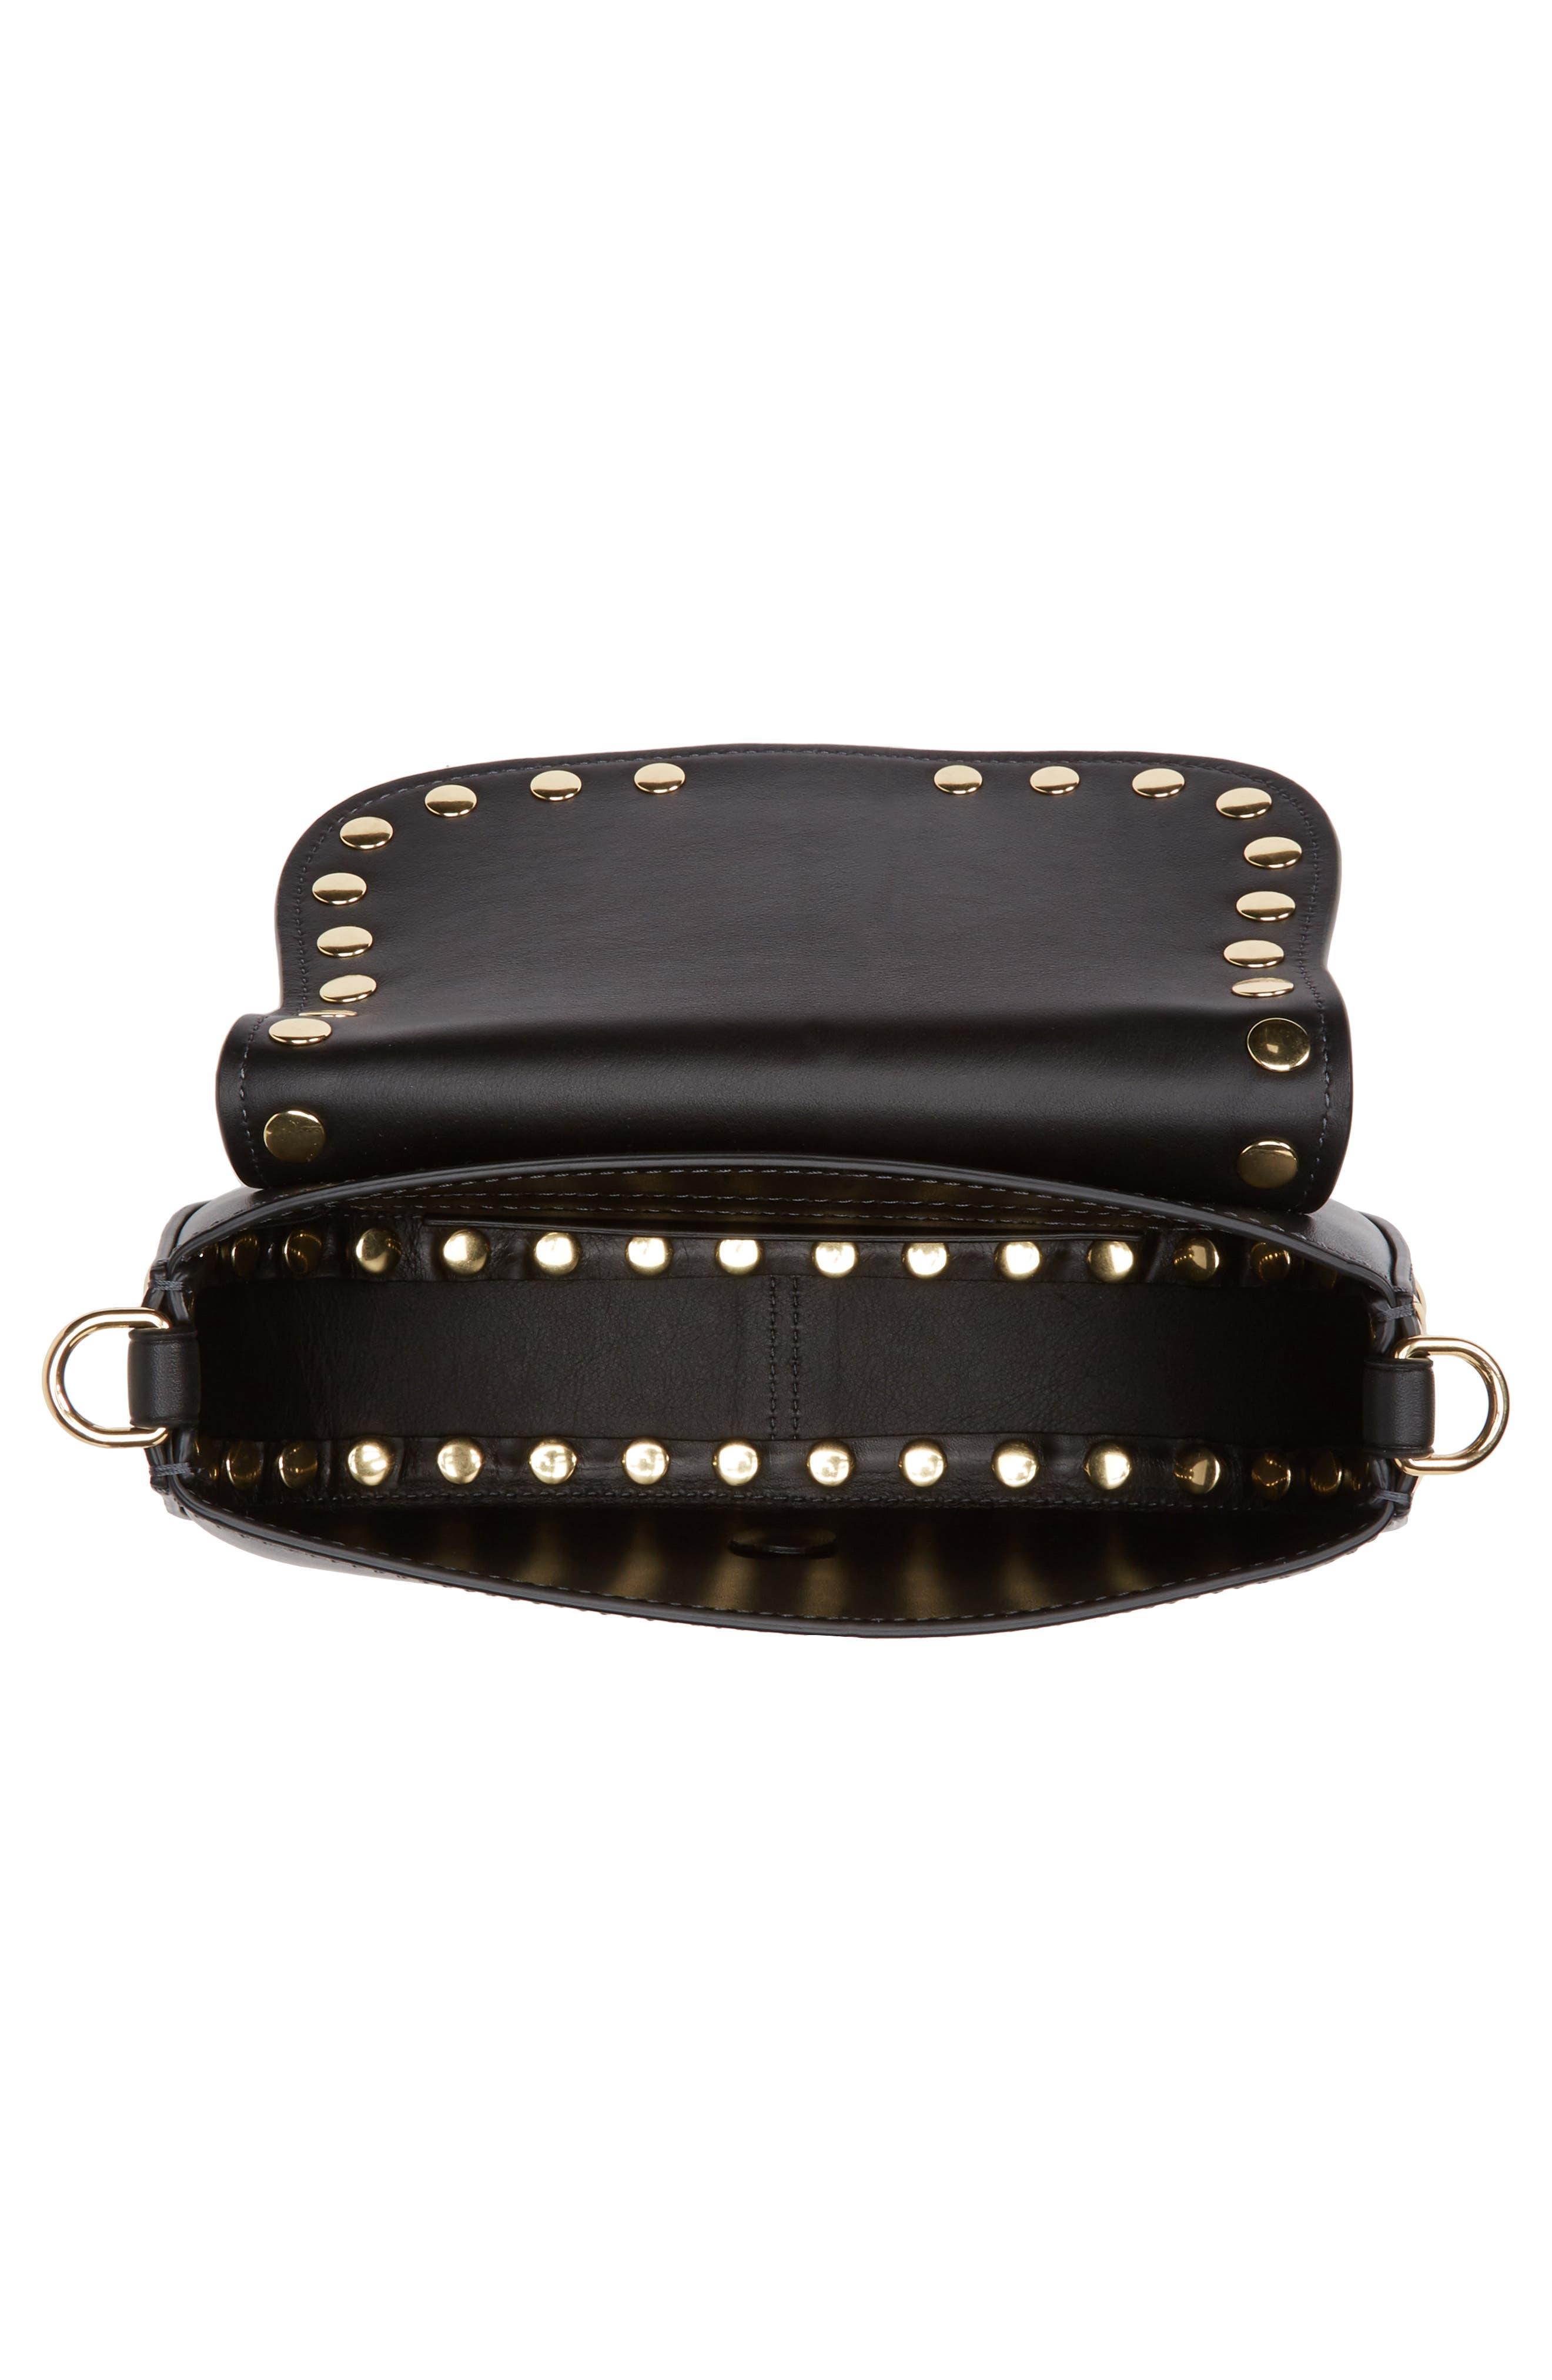 Studded Navigator Leather Crossbody Bag,                             Alternate thumbnail 4, color,                             001